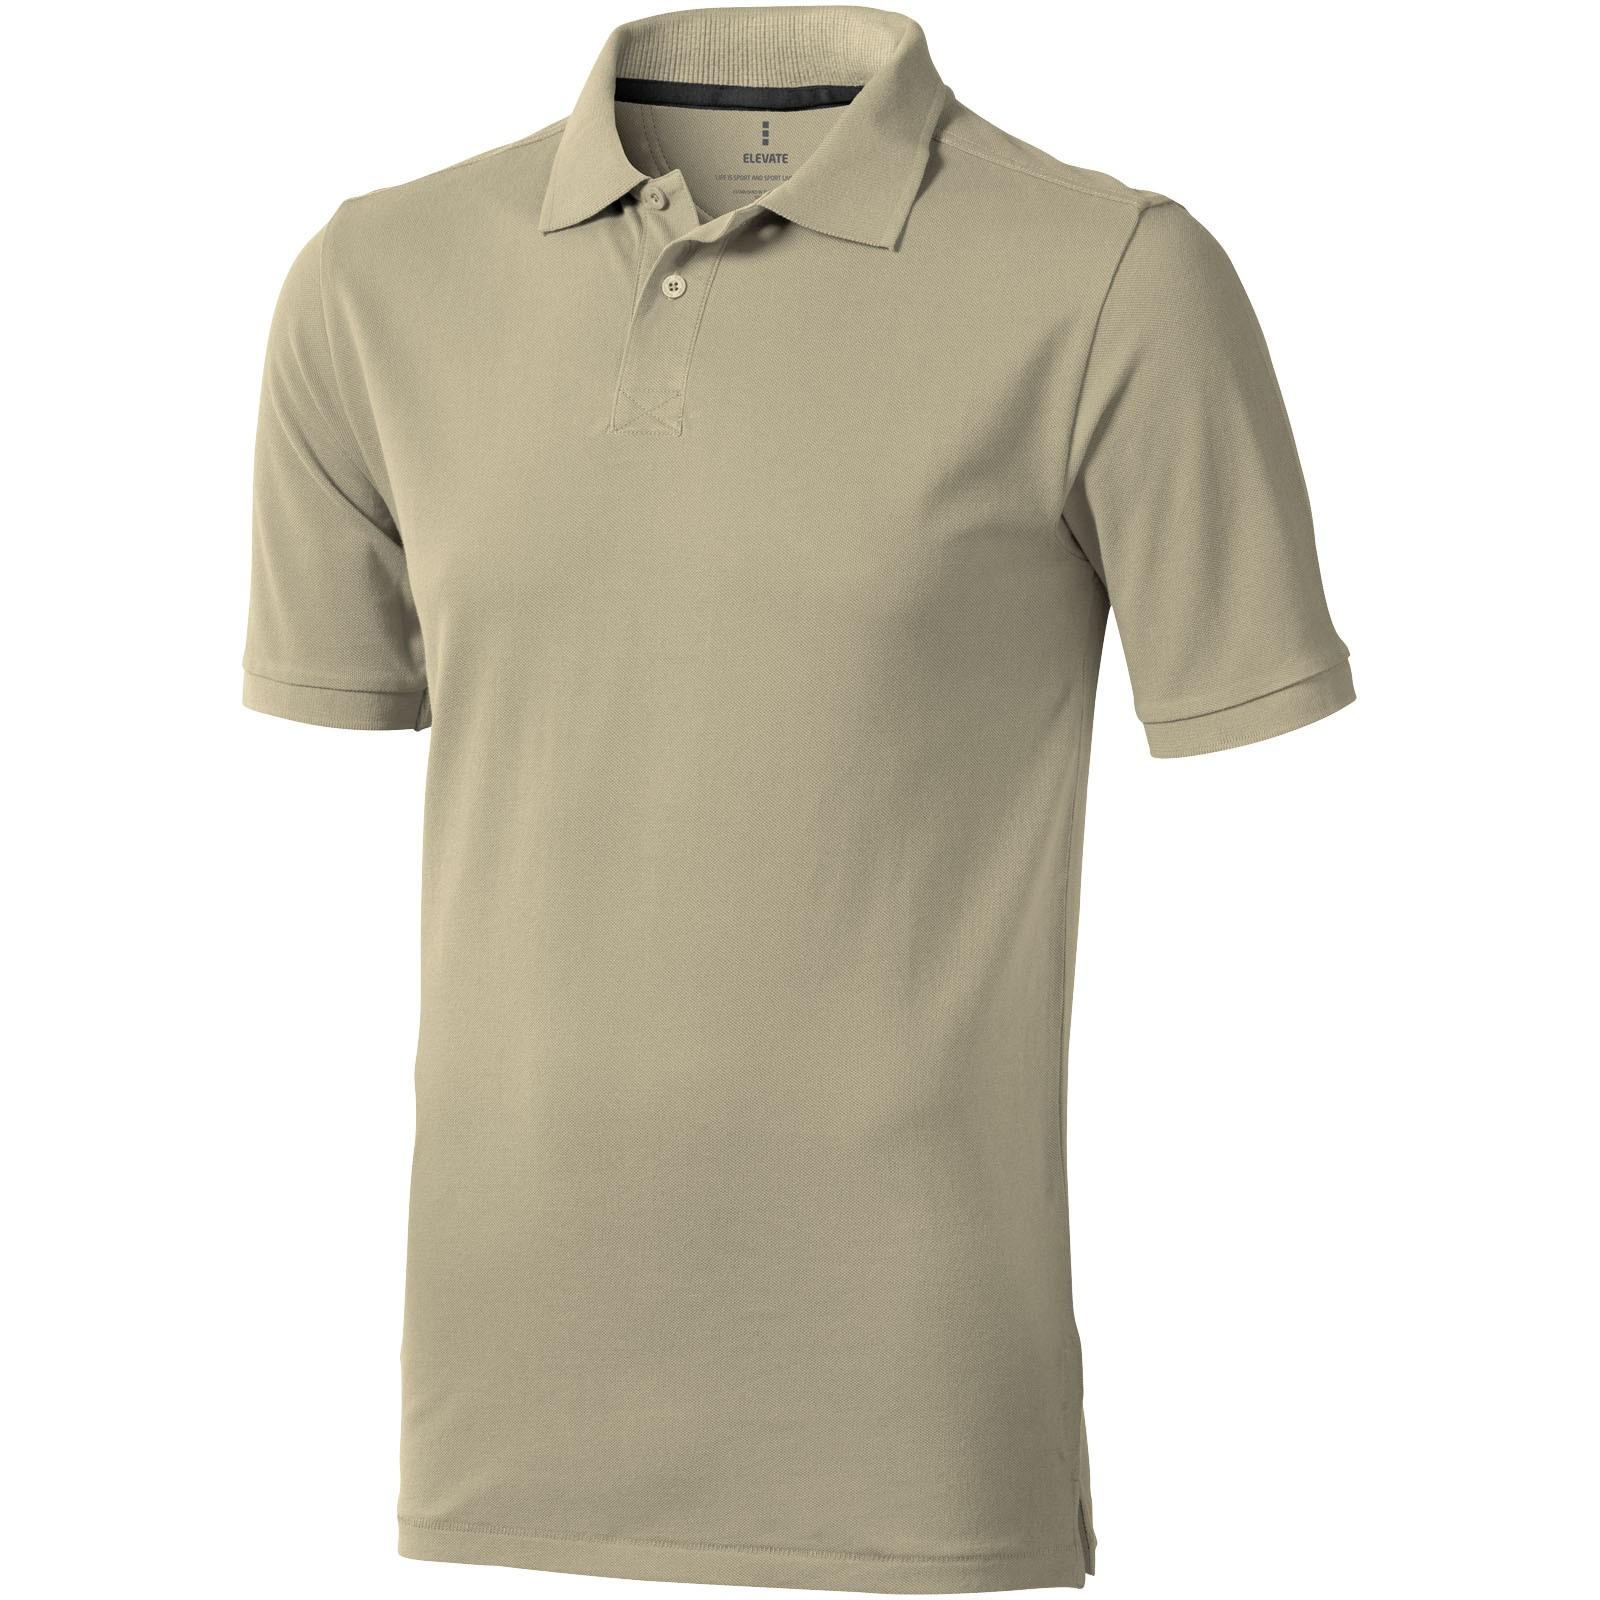 Calgary short sleeve men's polo - Khaki / M